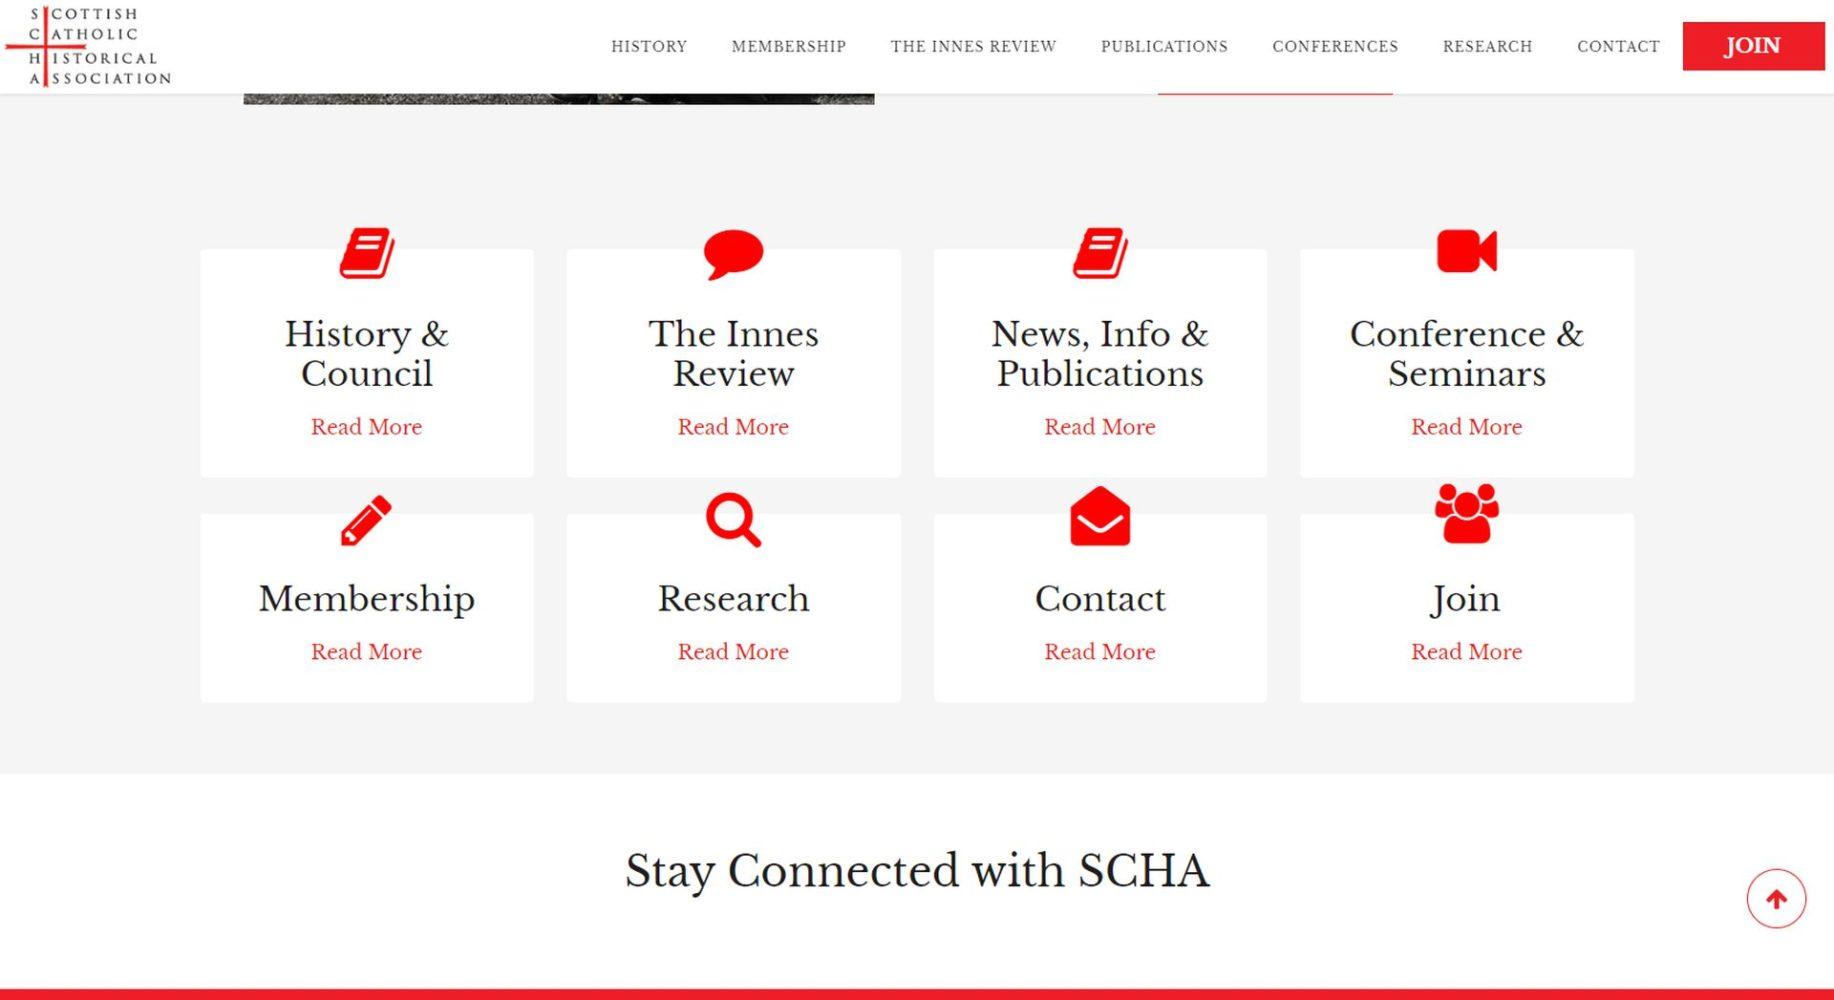 Scottish Catholic Historical Association Website Design Menu